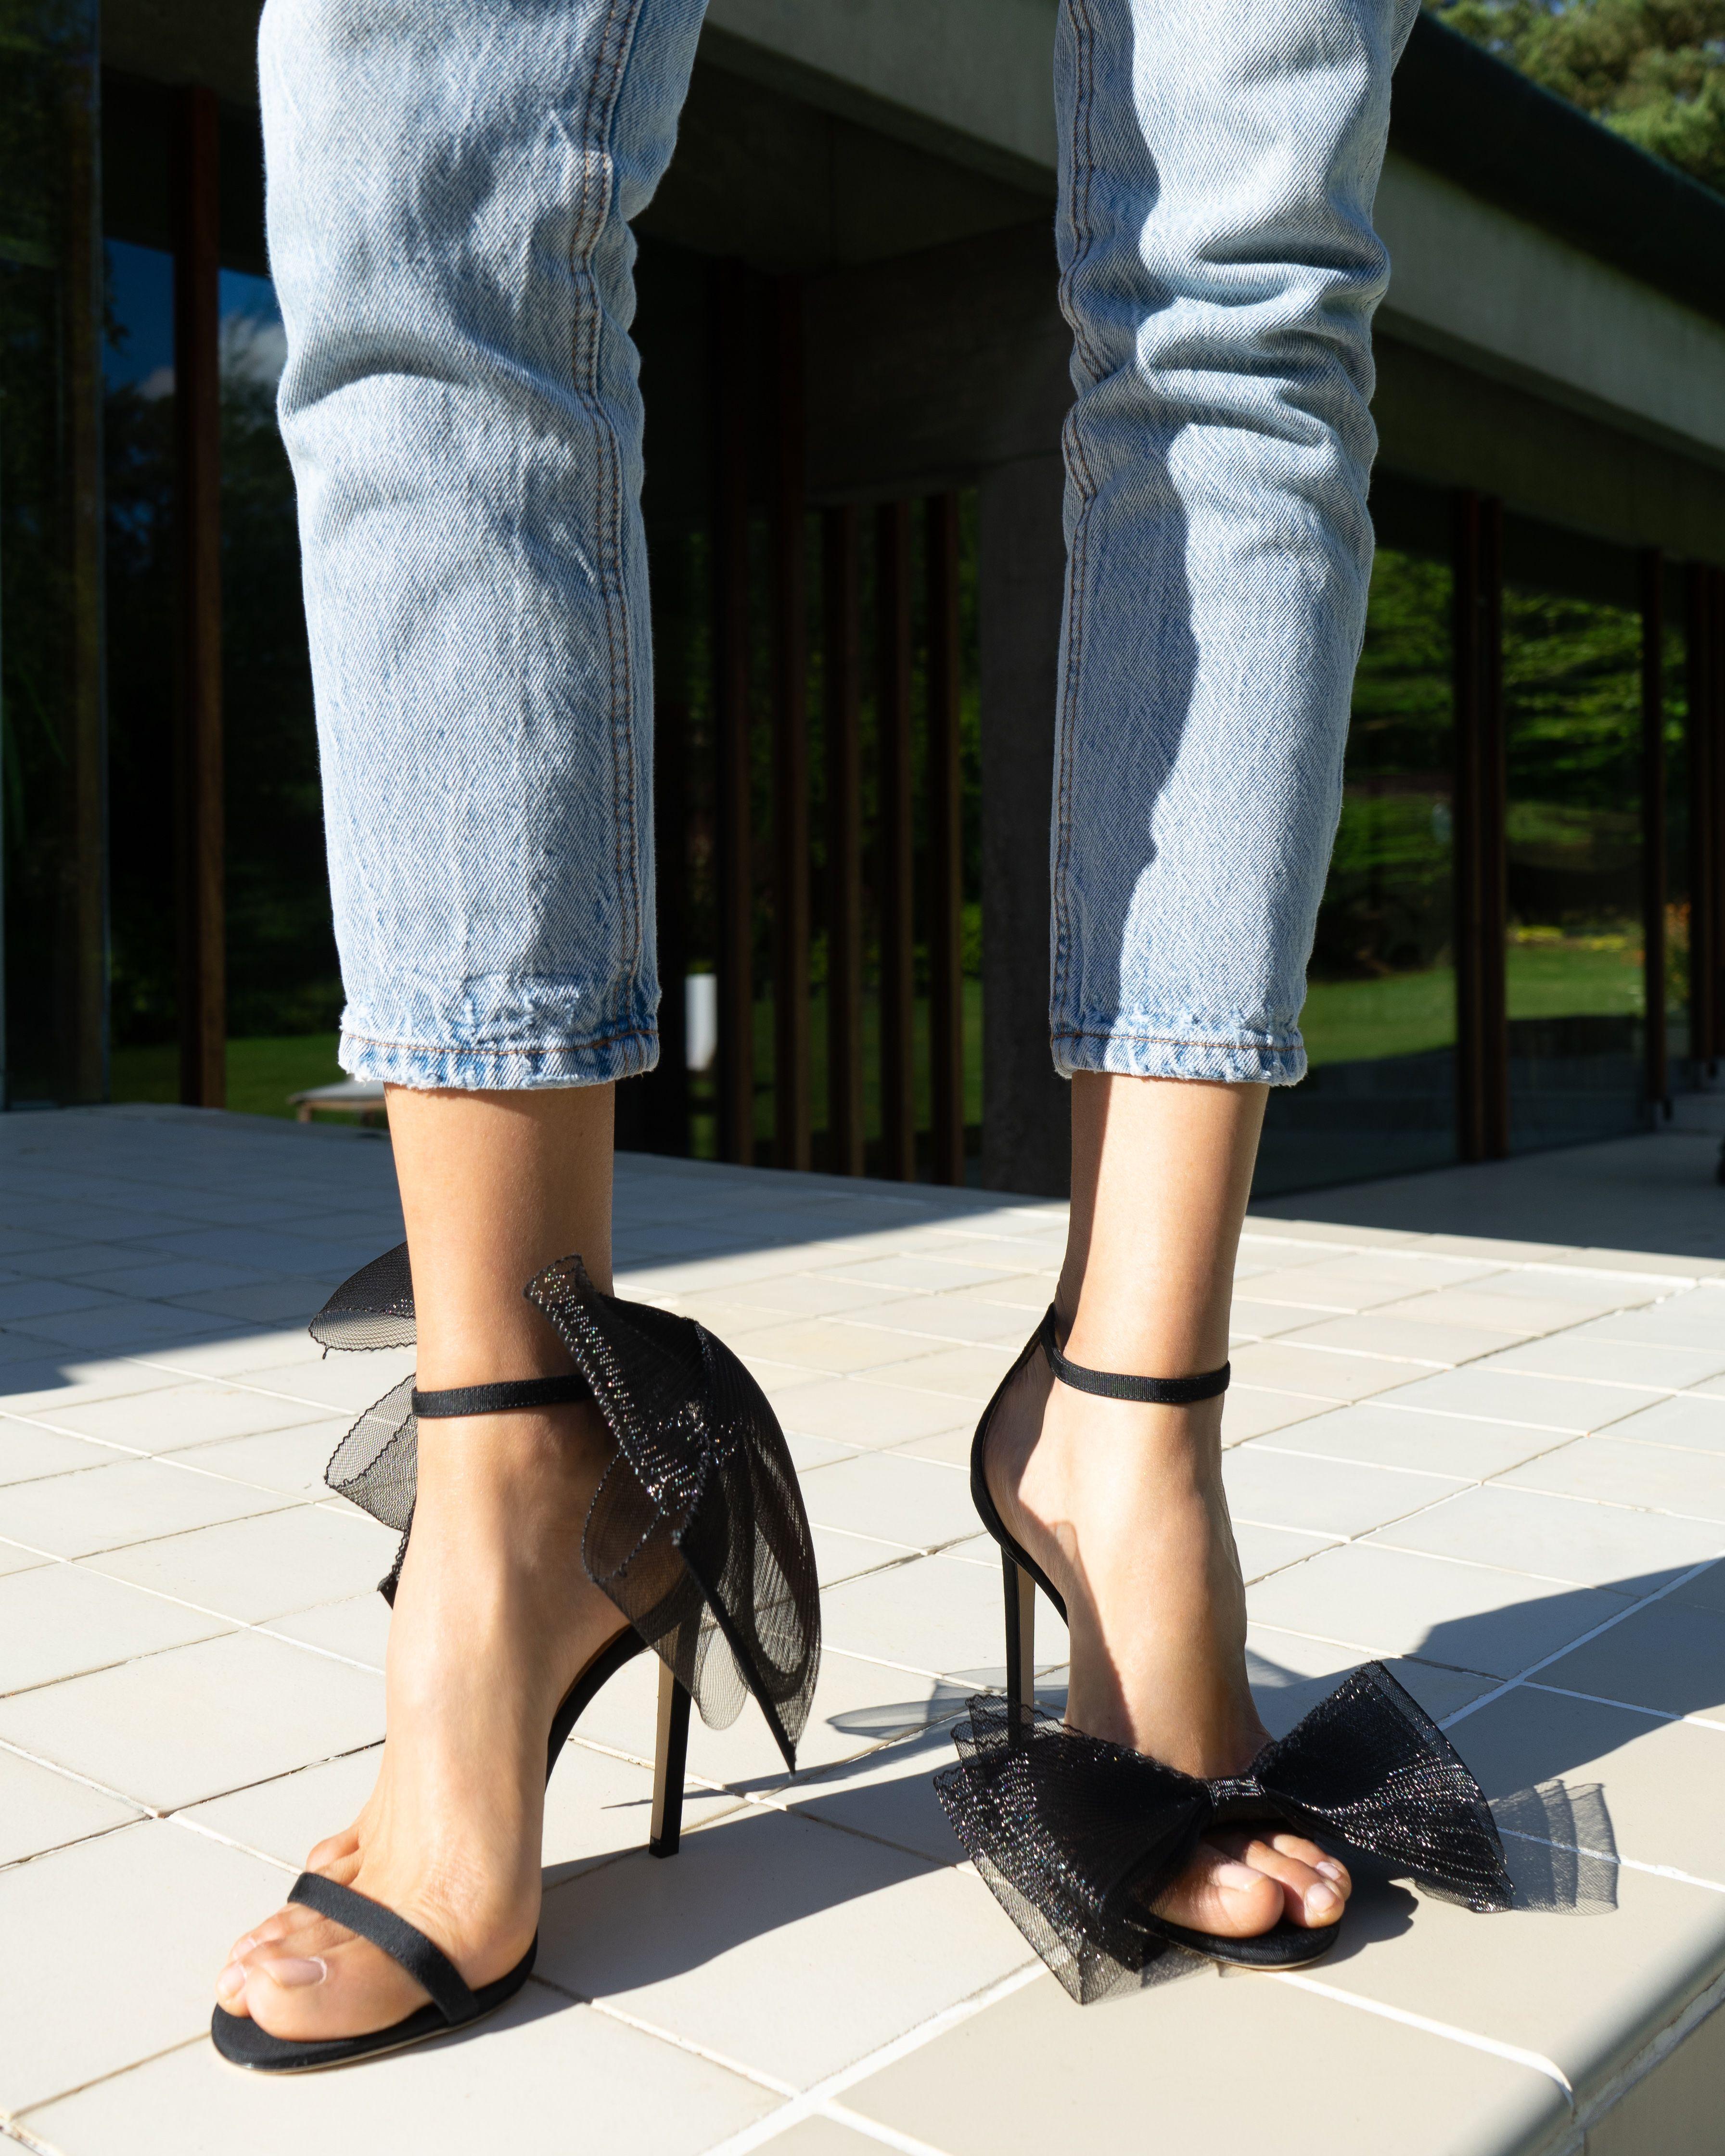 628f1b78cb4 JIMMY CHOO Aveline 100 bow-embellished grosgrain sandals | Dress ...